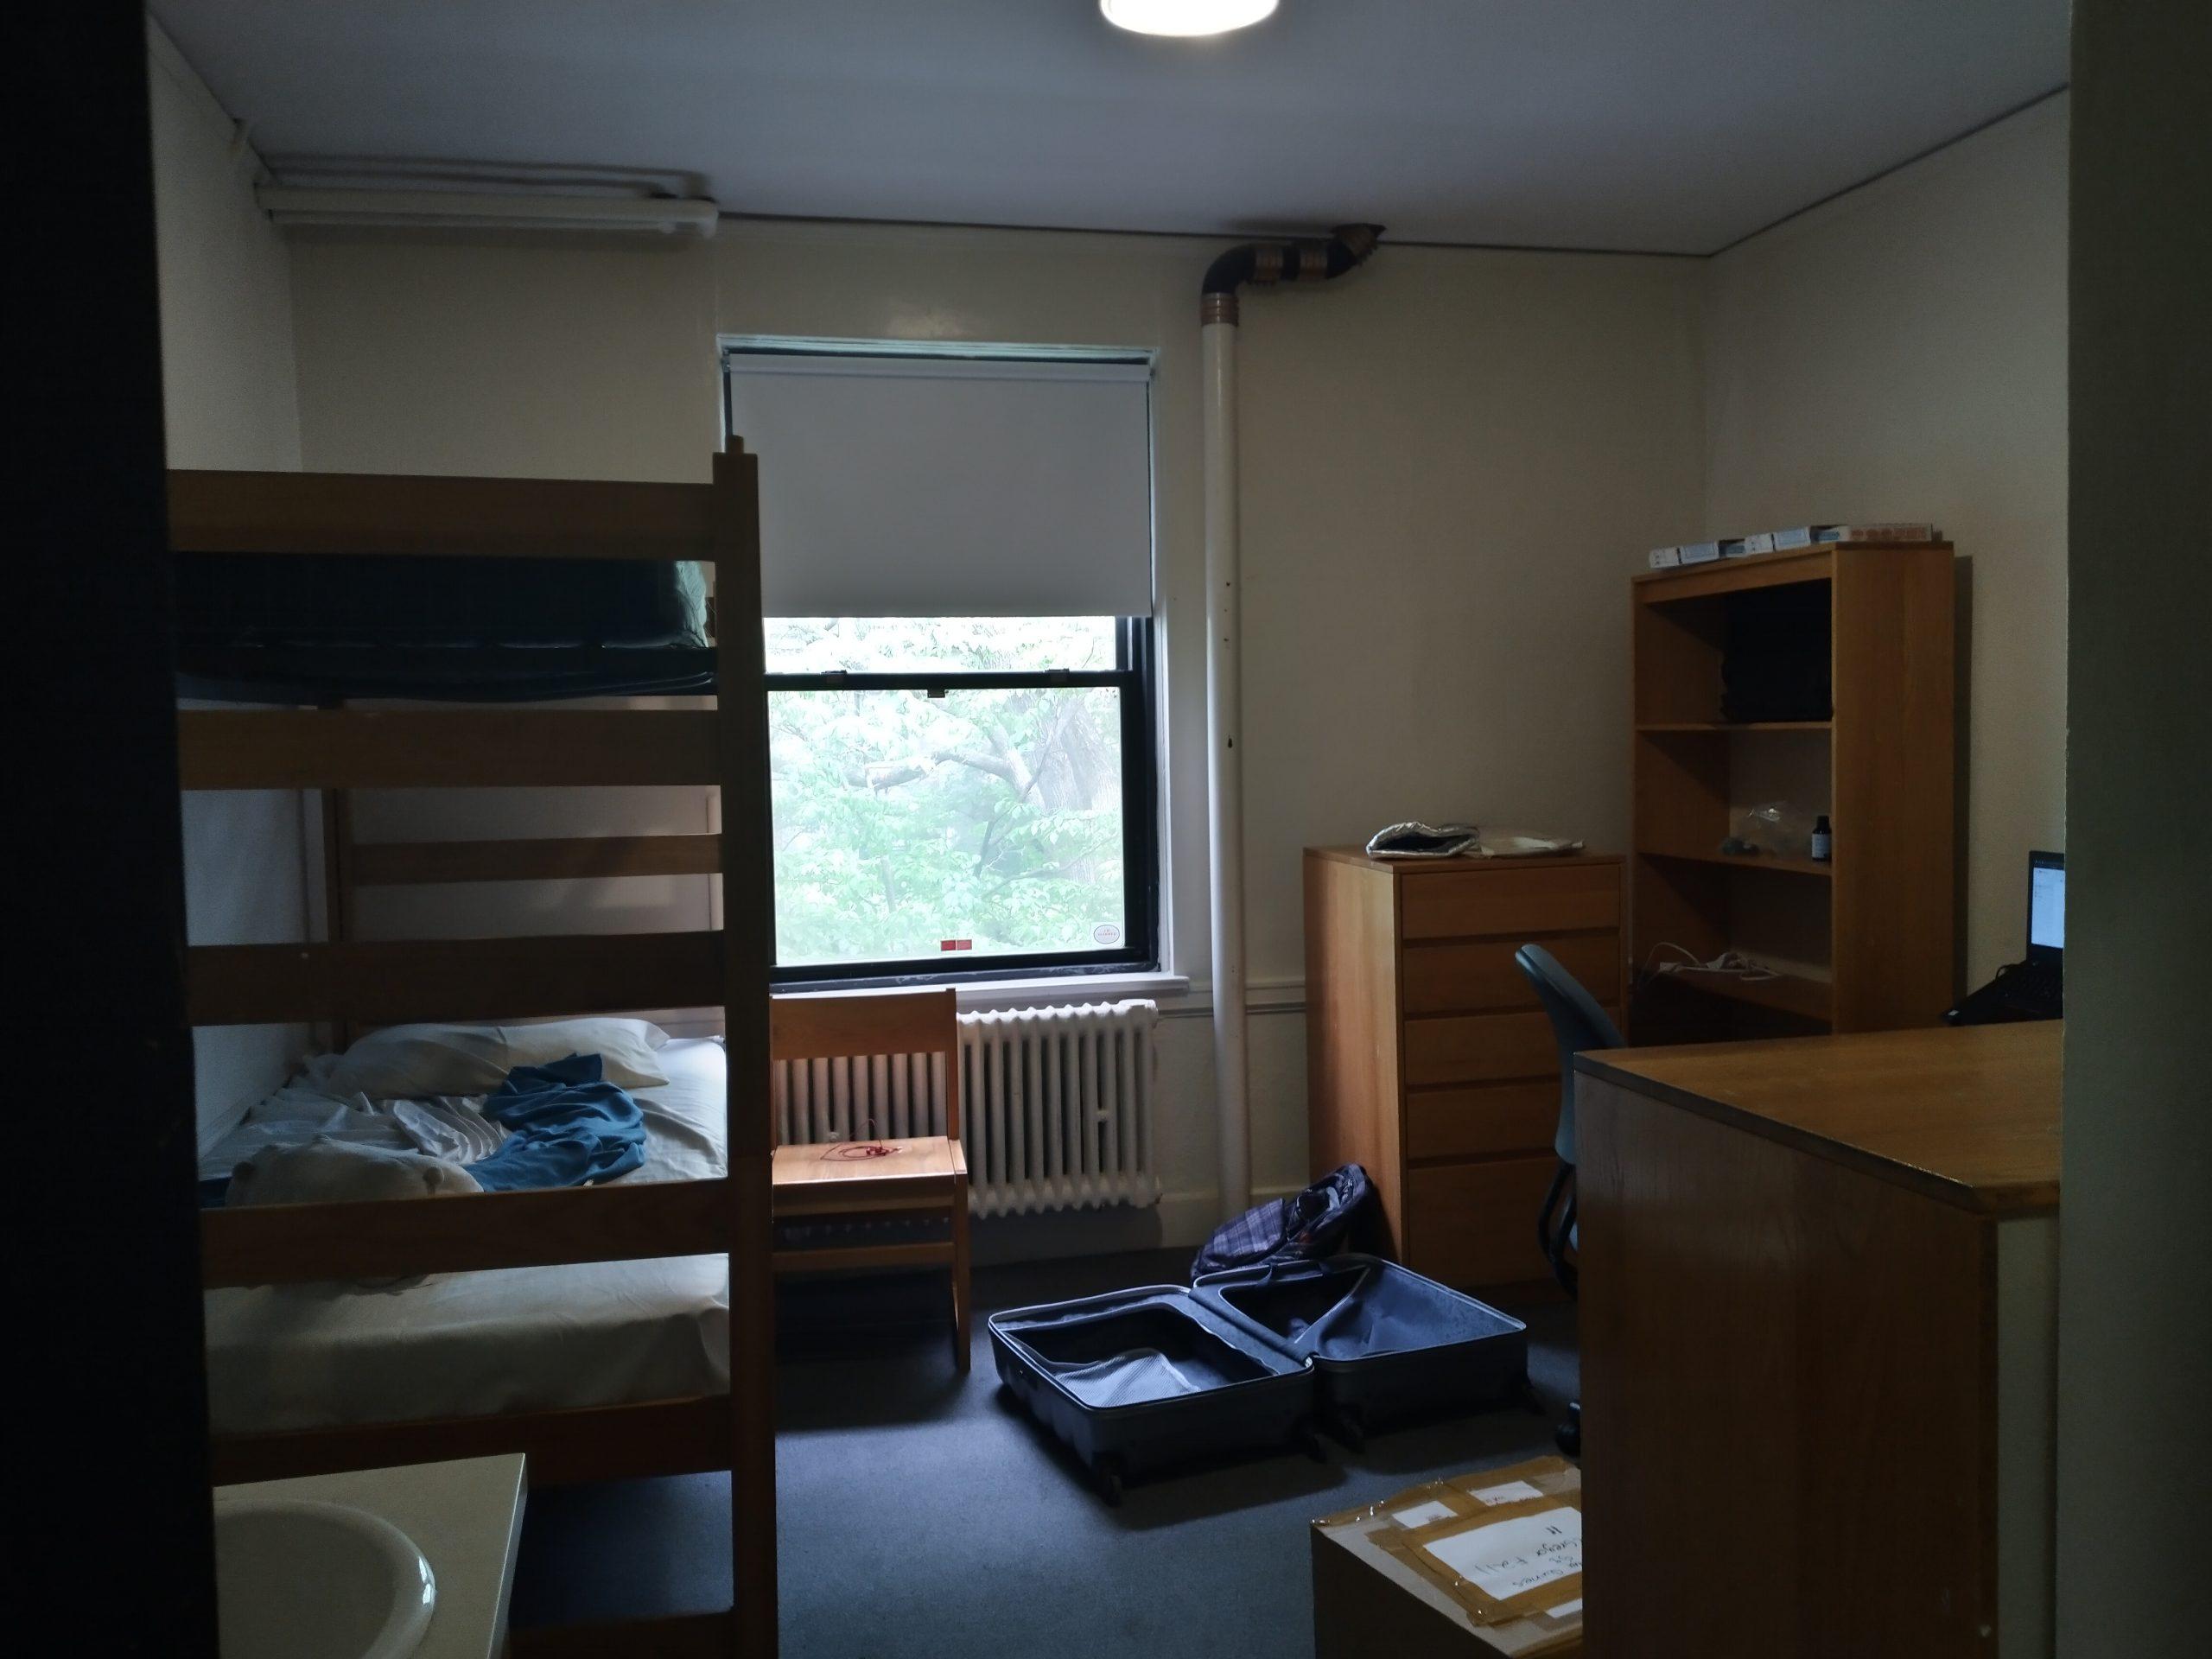 my bedroom in east campus